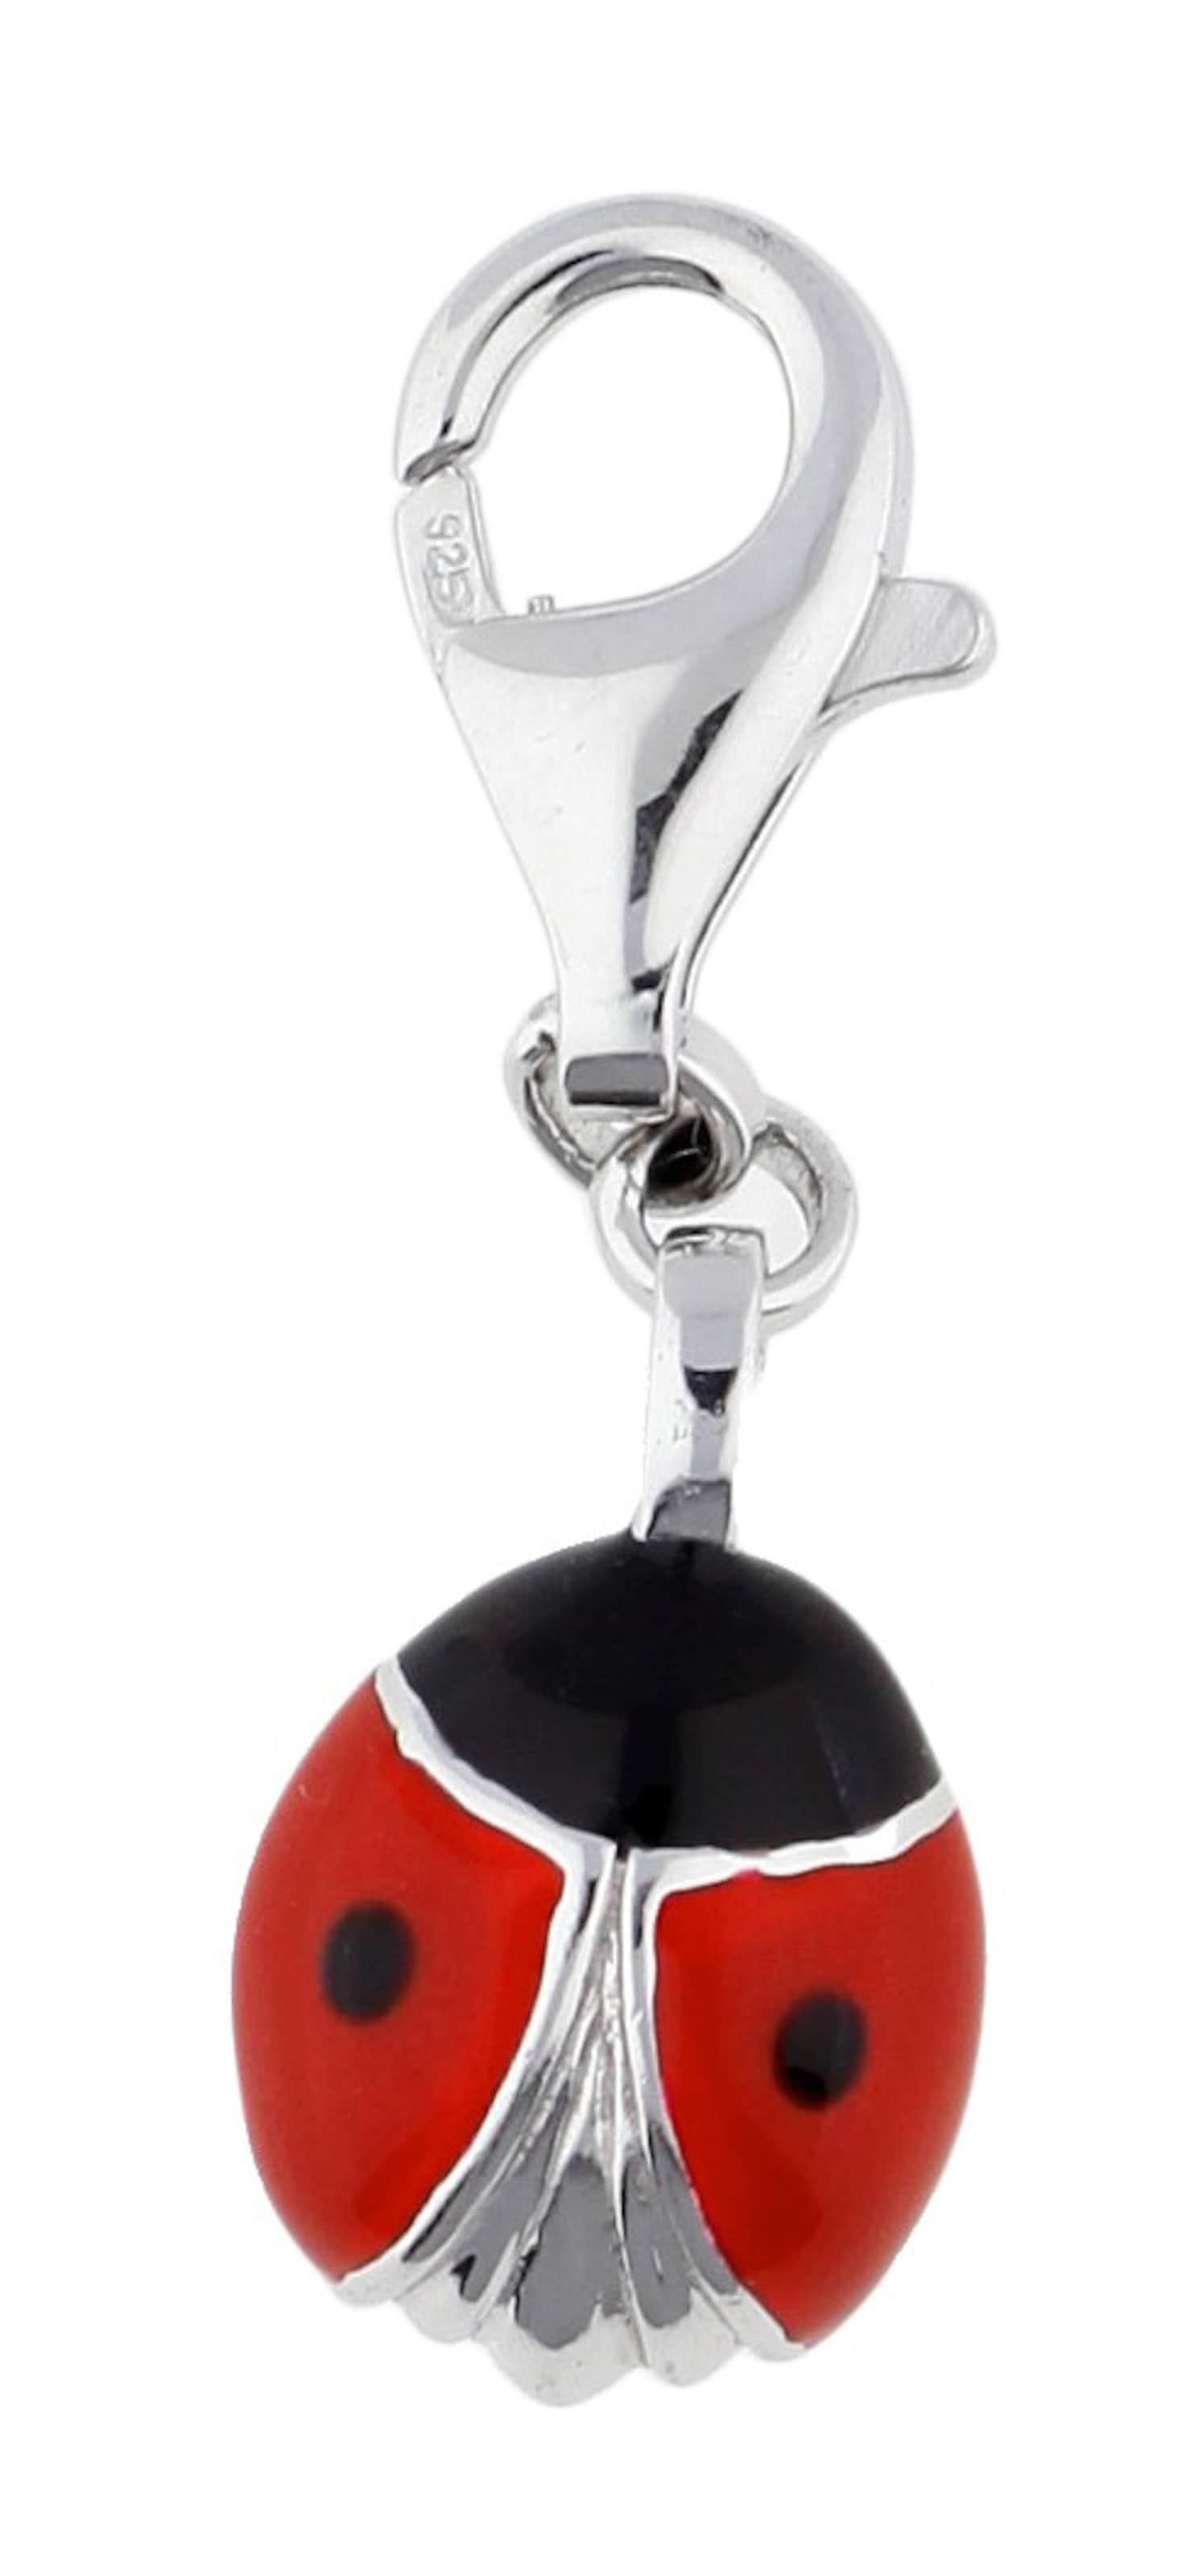 Kauf Verkauf Online Freies Verschiffen Große Auswahl An ESPRIT Anhänger 'Ladybug ESCH90910A000' Rabatt Besuch Neu bZkBXOG